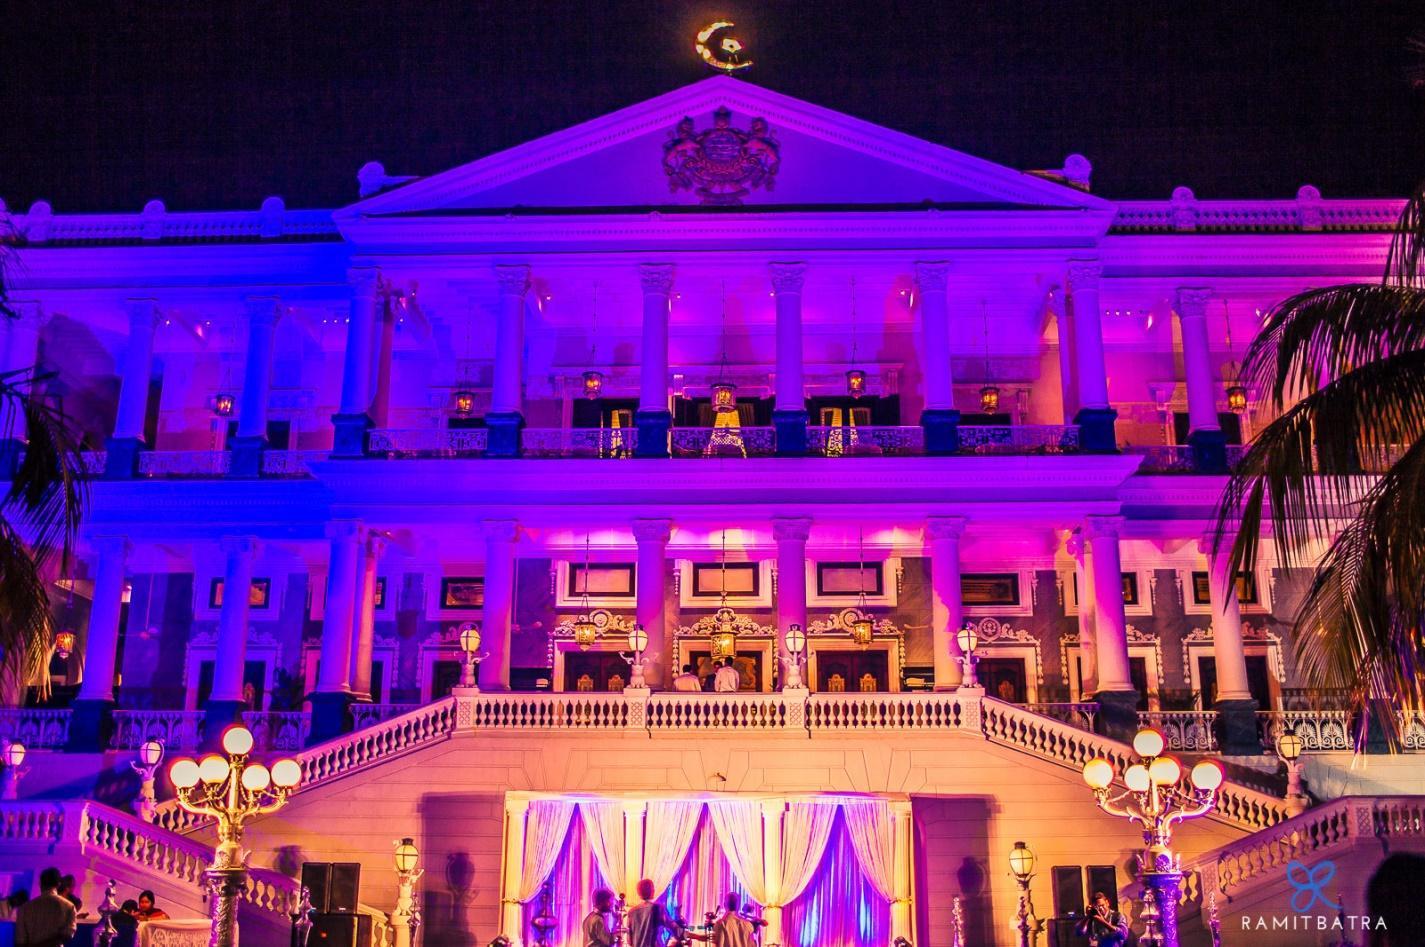 http://www.ramitbatra.com/blog/wp-content/uploads/2016/02/Wedding-Photographer-Hyderabad-India-RamitBatra_09.jpg